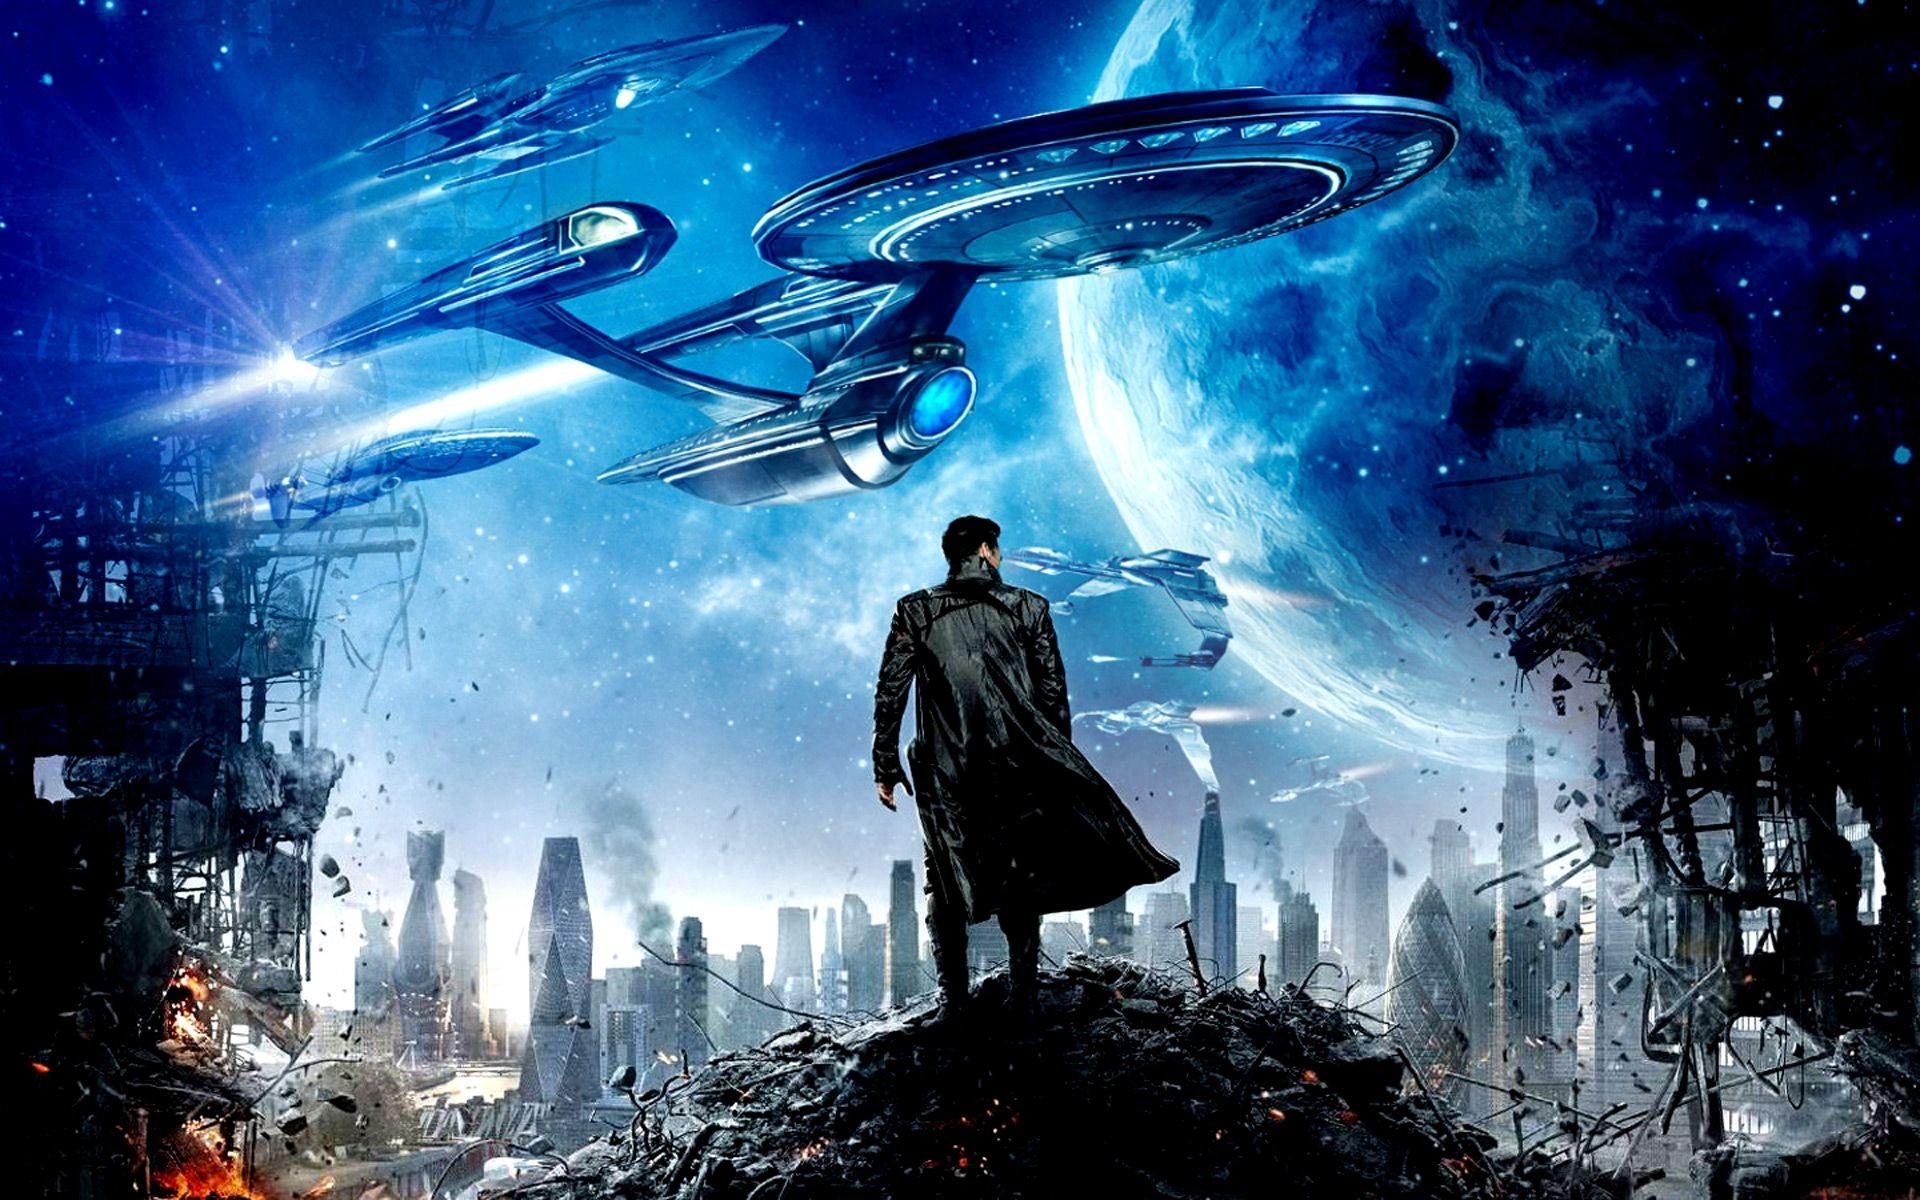 Star Trek Beyond HQ wallpapers Star Trek Beyond Desktop wallpapers